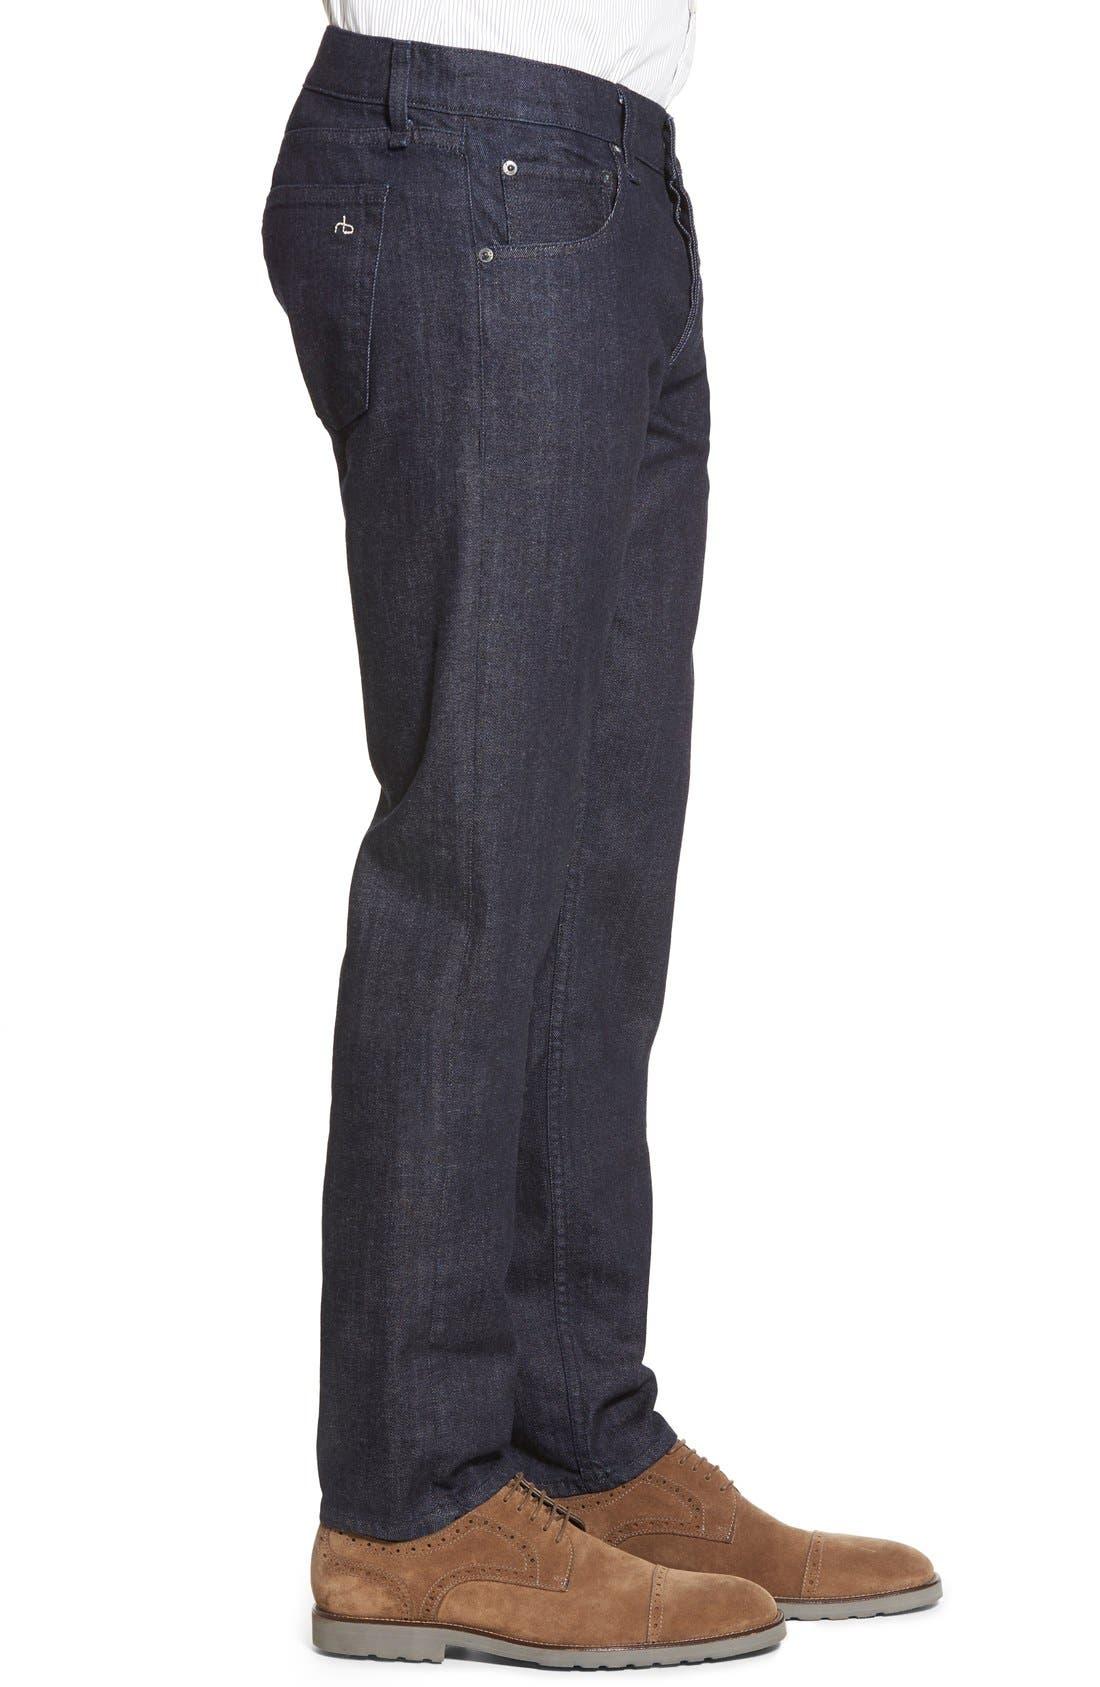 RAG & BONE, Standard Issue Fit 2 Slim Fit Jeans, Alternate thumbnail 6, color, TONAL RINSE